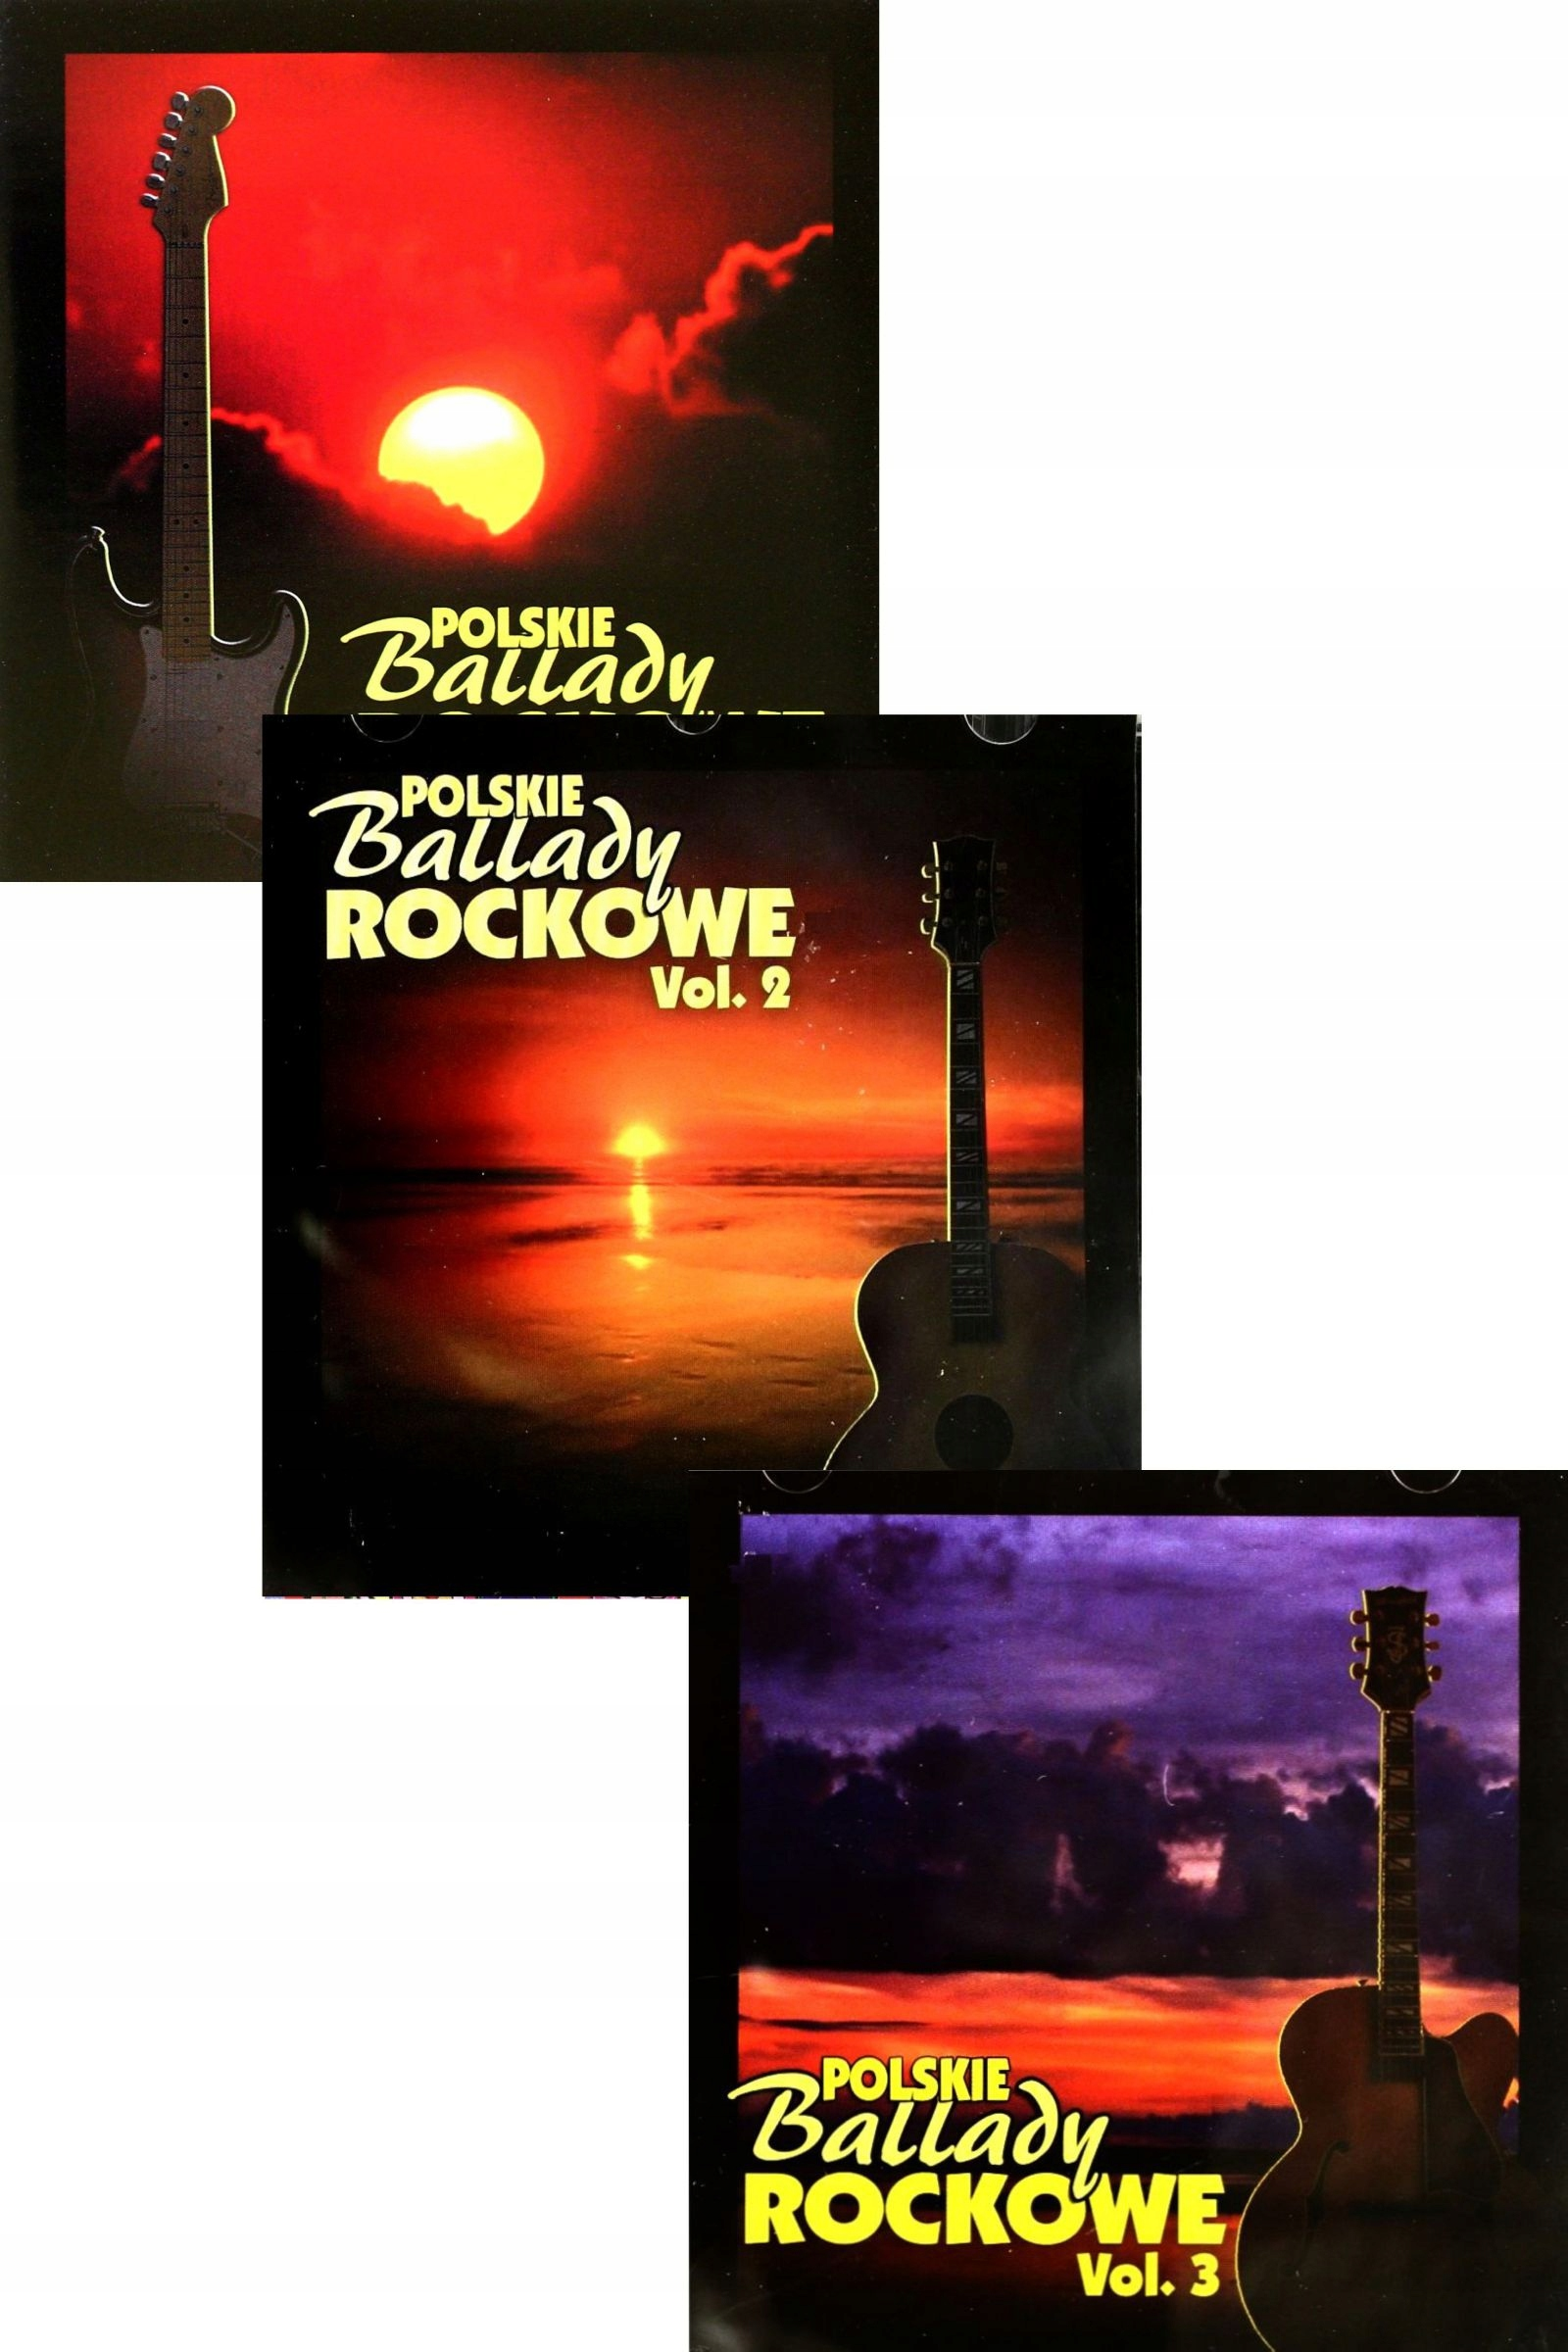 Item POLISH ROCK BALLADS-CULT, THE MAIN DISADVANTAGE IS NOT, TSA (3CD)